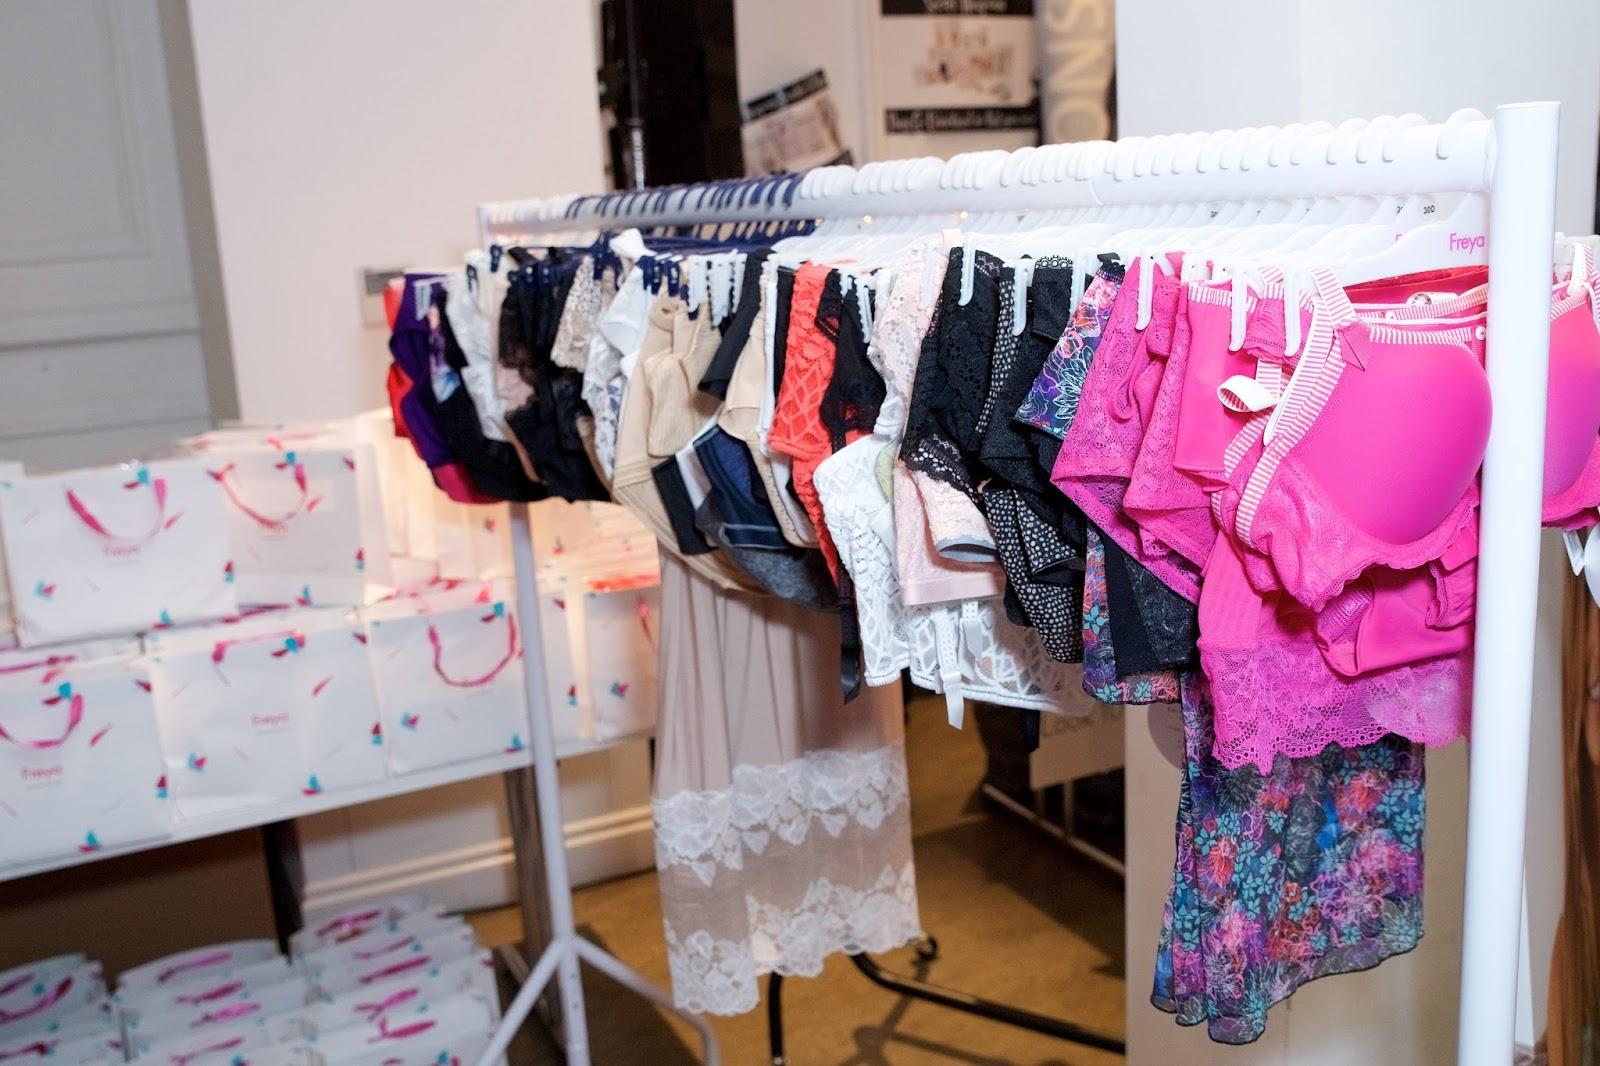 freya underwear